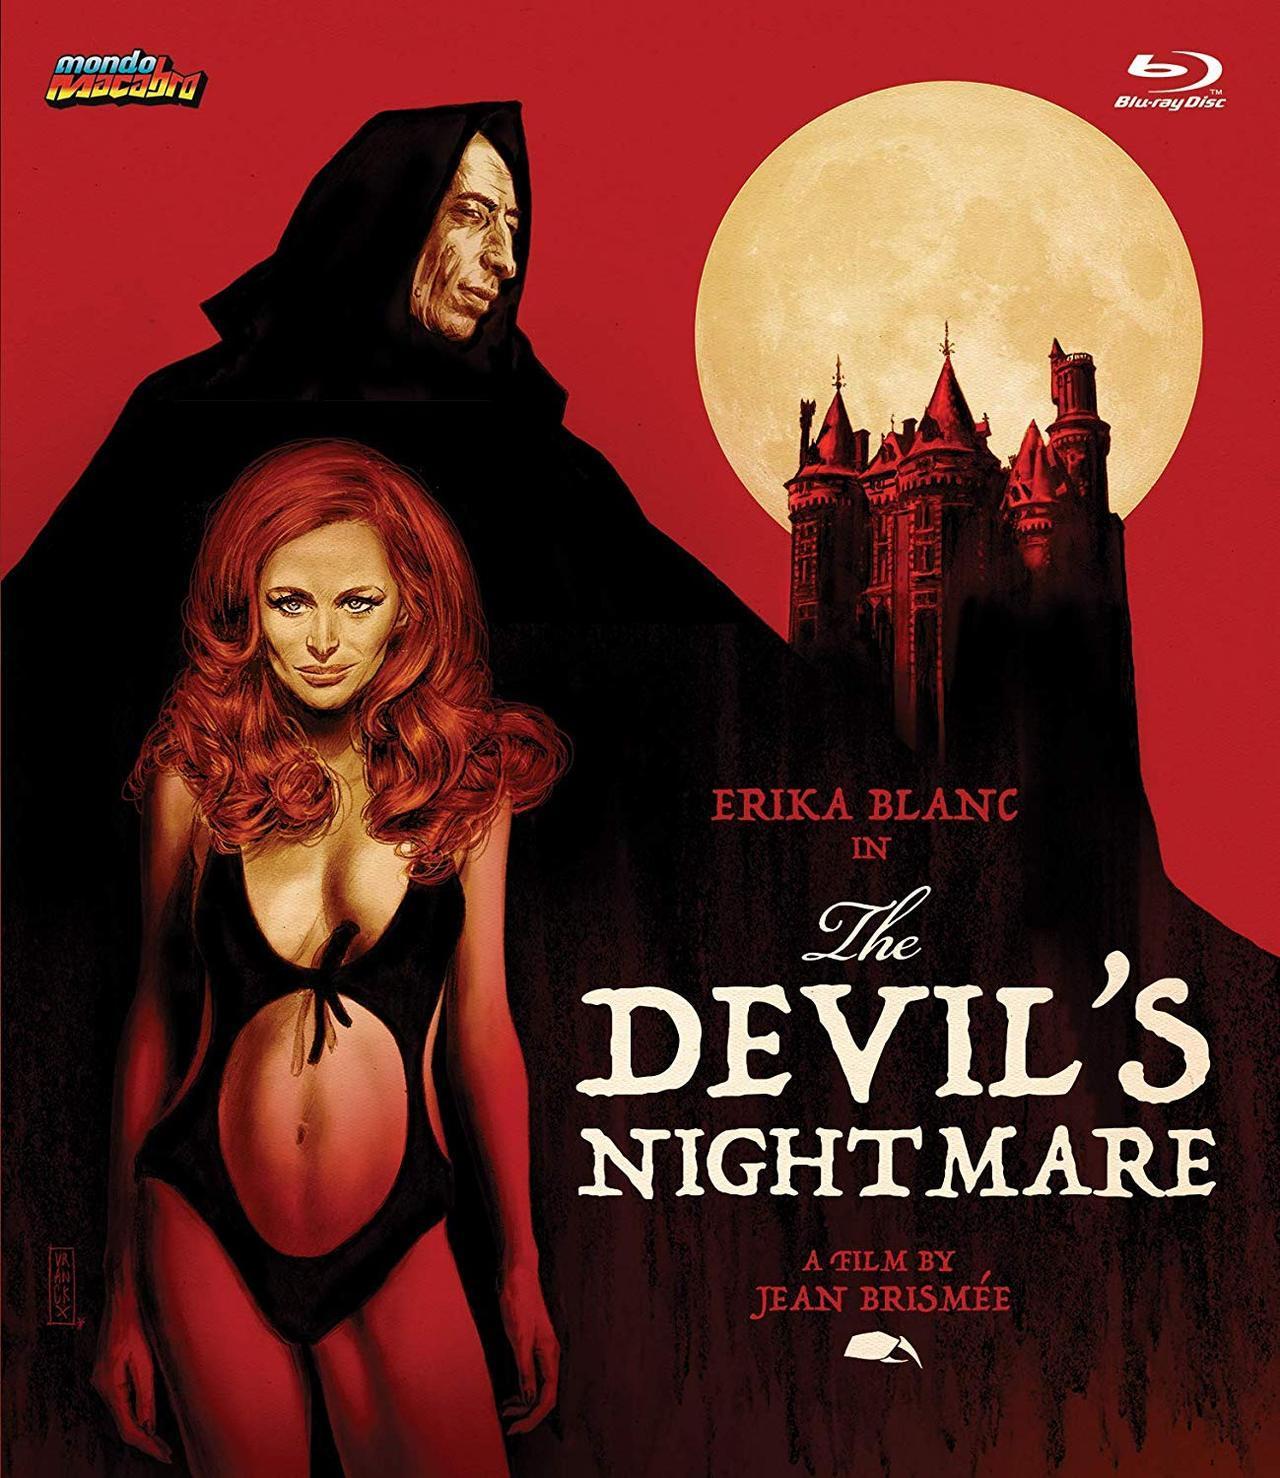 the devil's nightmare blu-ray